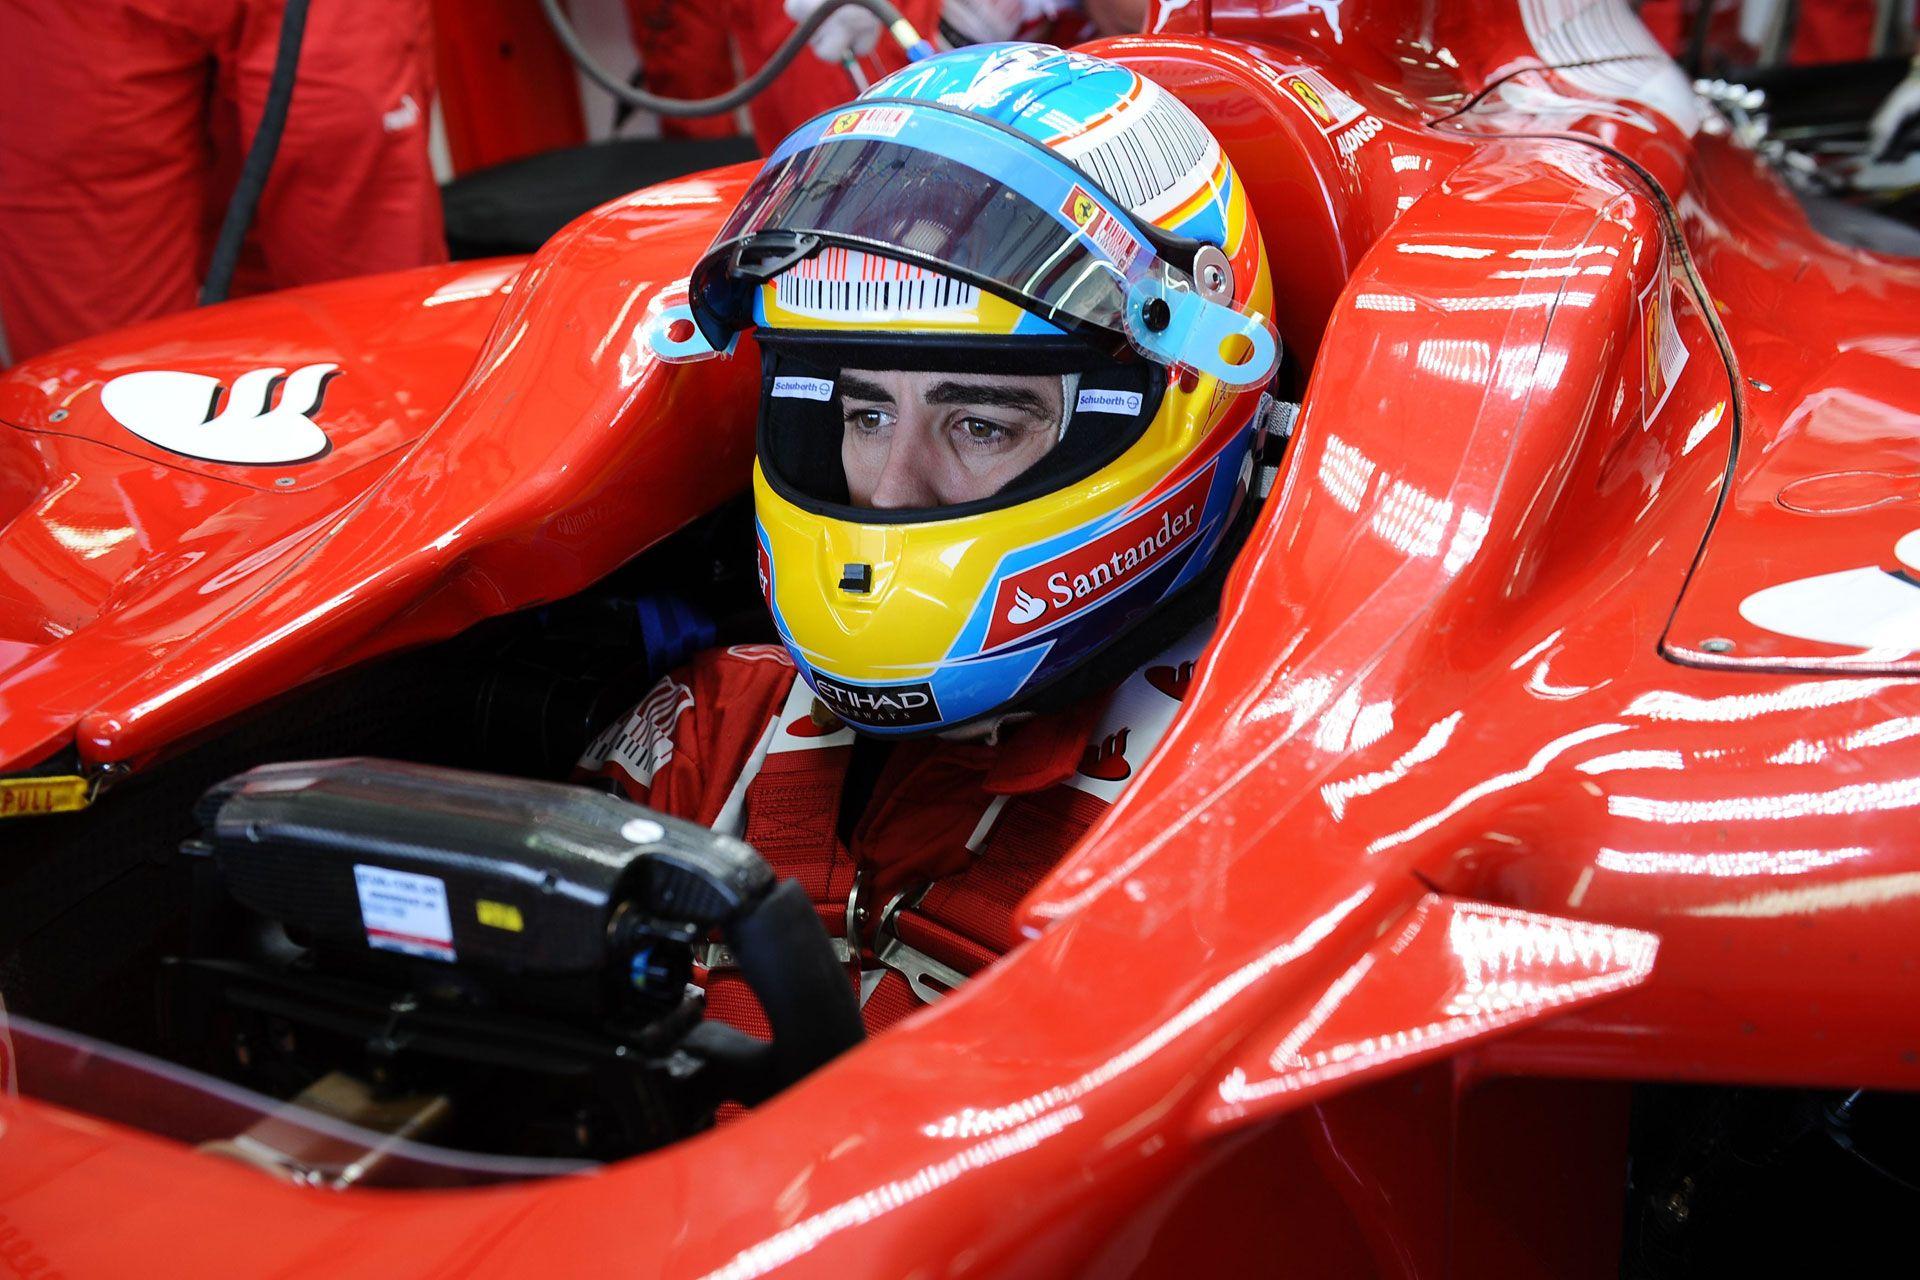 Fernando Alonso F1 Wallpaper Alonso